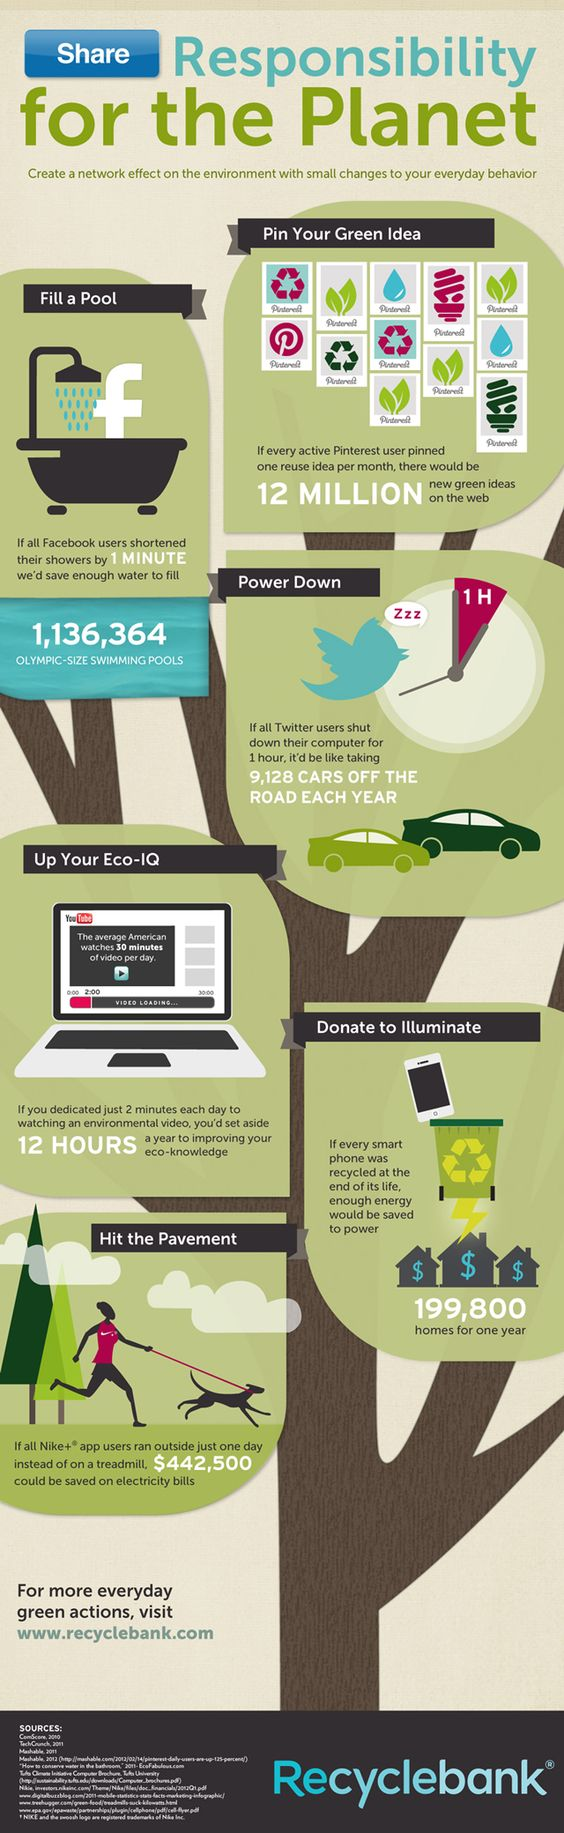 Environmental awareness for the social media enthusiast...